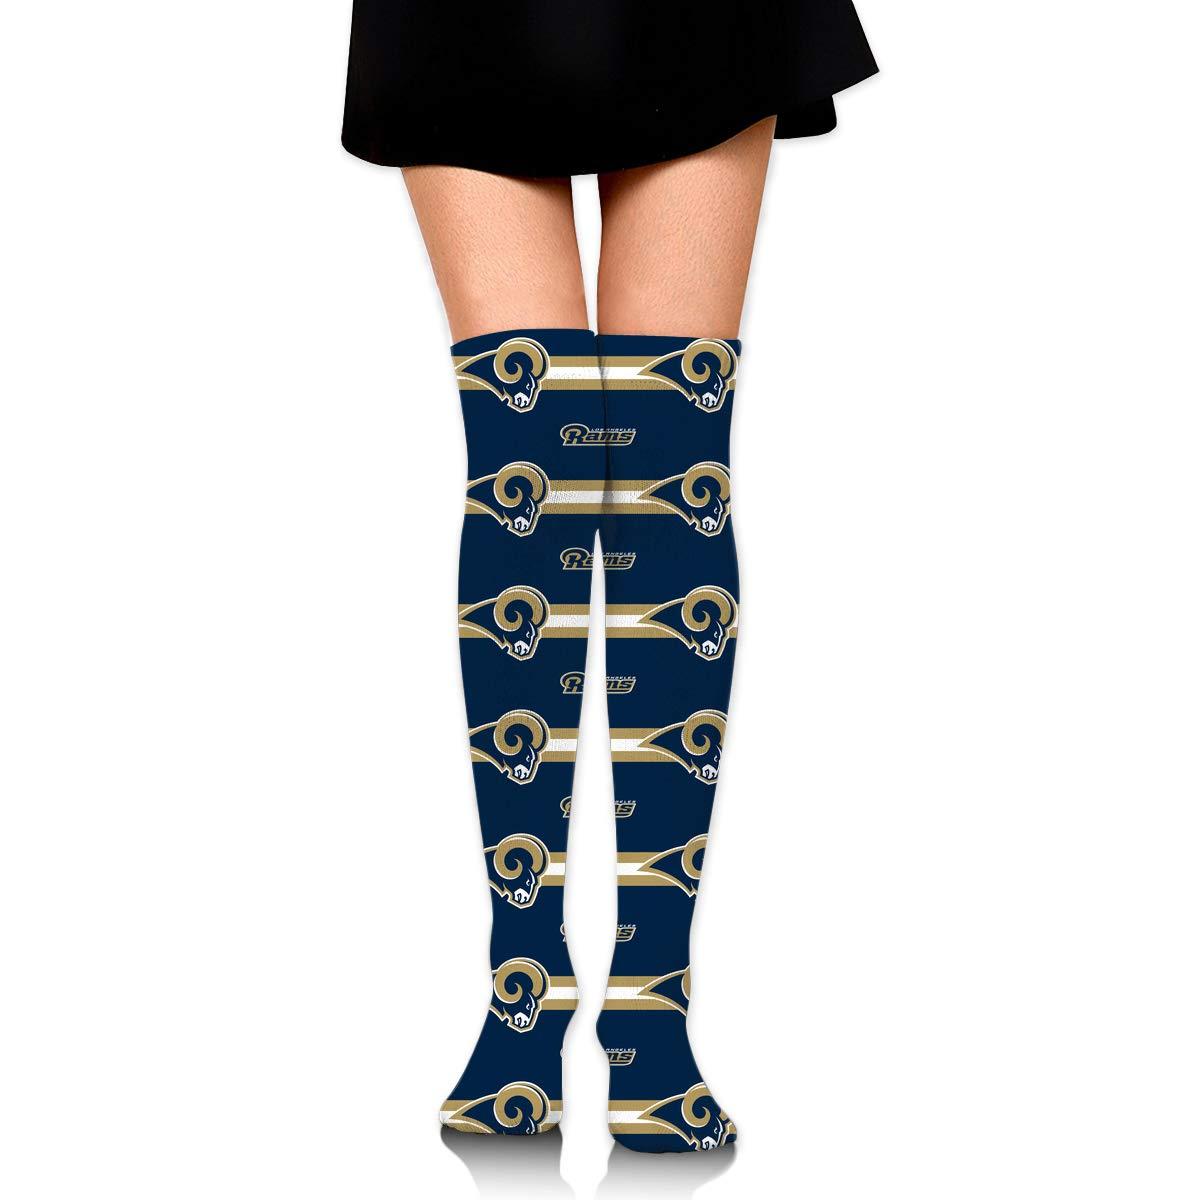 Sorcerer Custom Girls Over Knee High Boot Stockings Leg Warmers Los Angeles Rams Women's Polyester Thigh High Socks Gift by Sorcerer